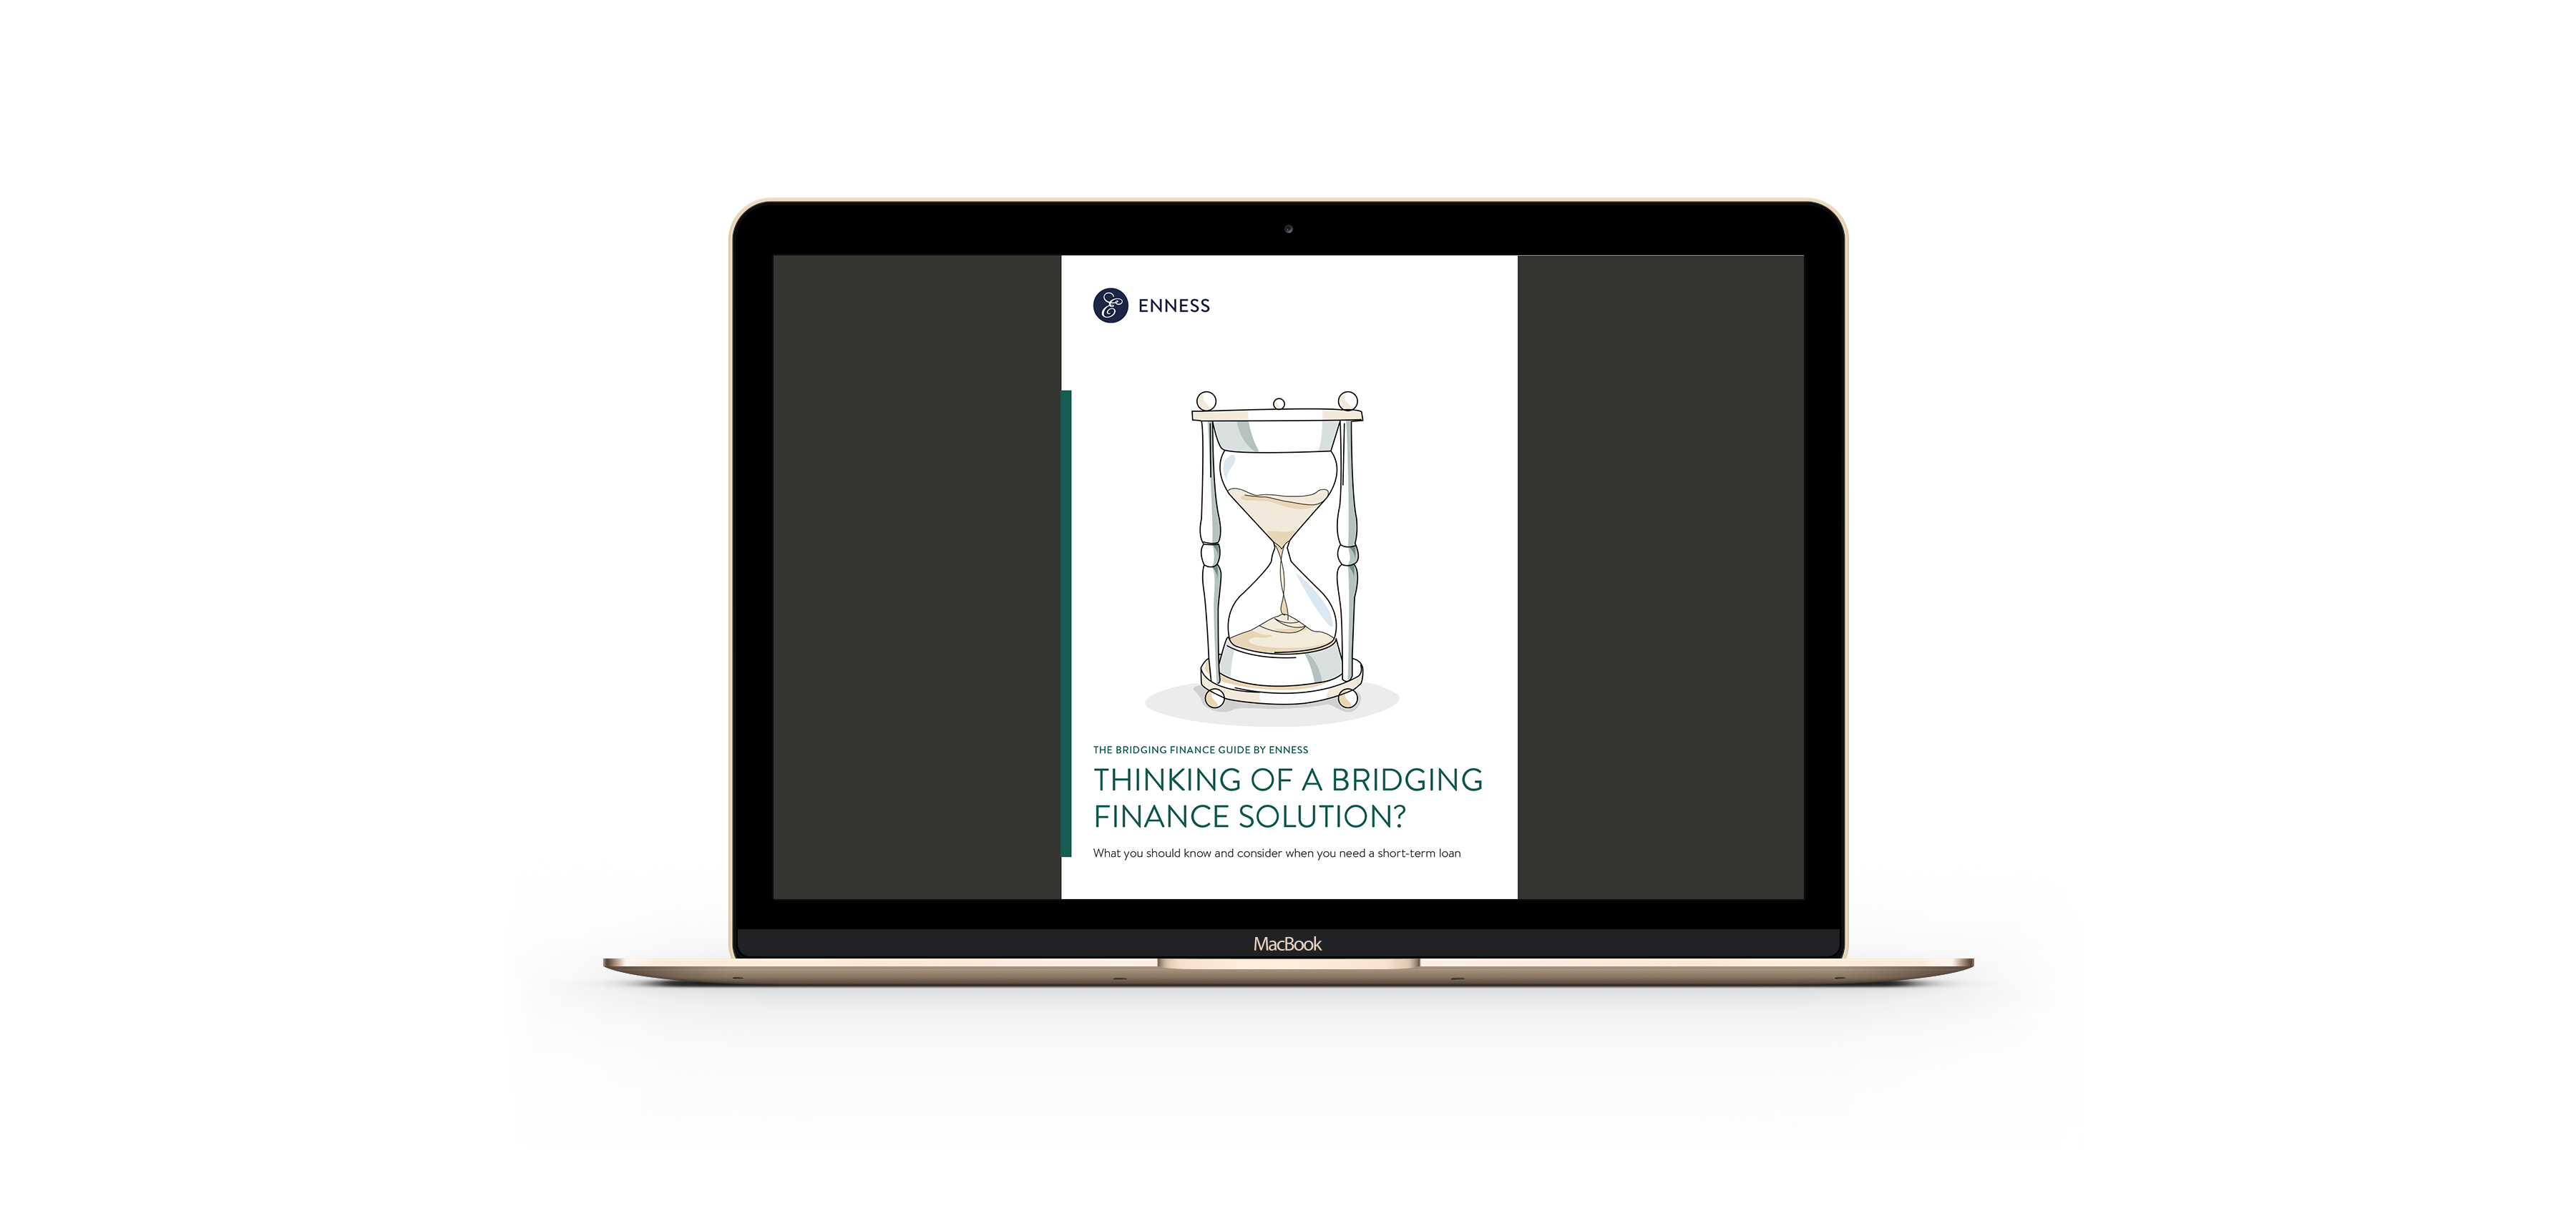 BridgingFinance_Guide_ibook.png